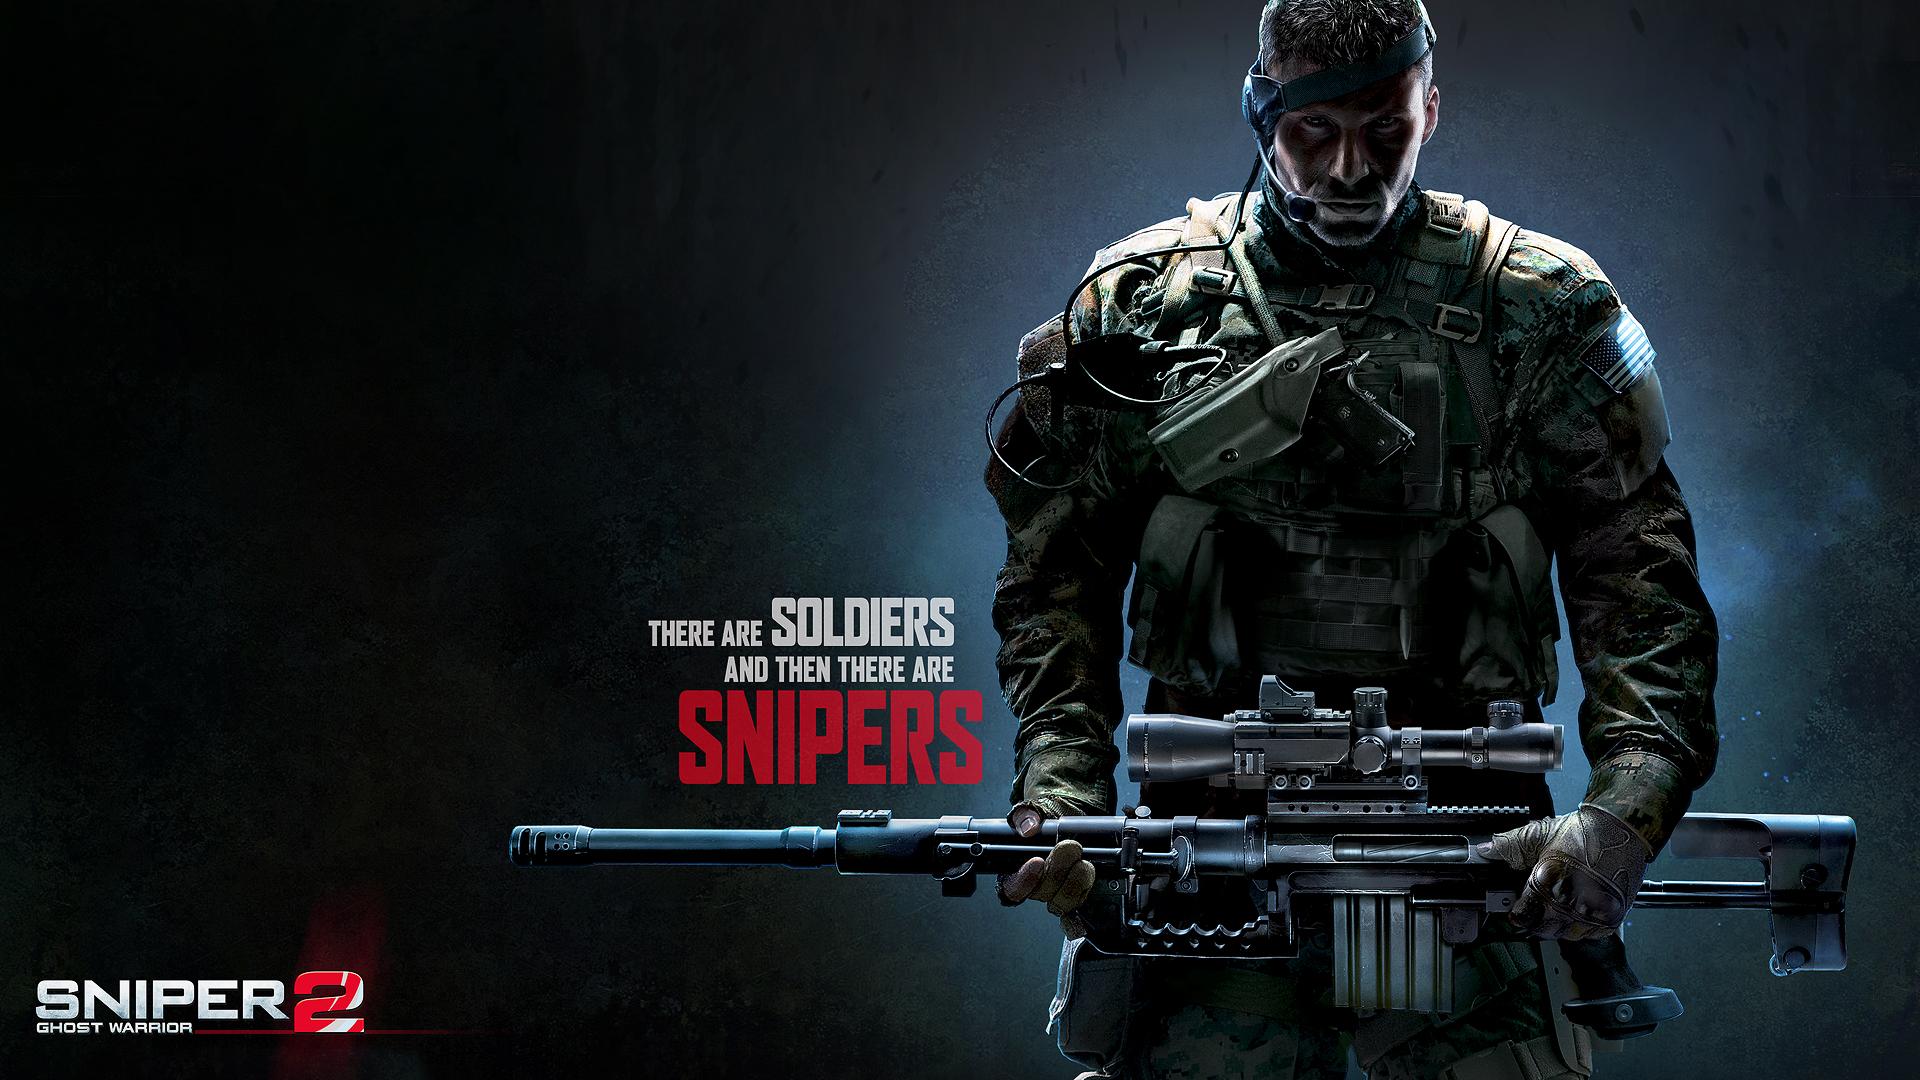 Sniper Ghost Warrior 2 wallpaper 4